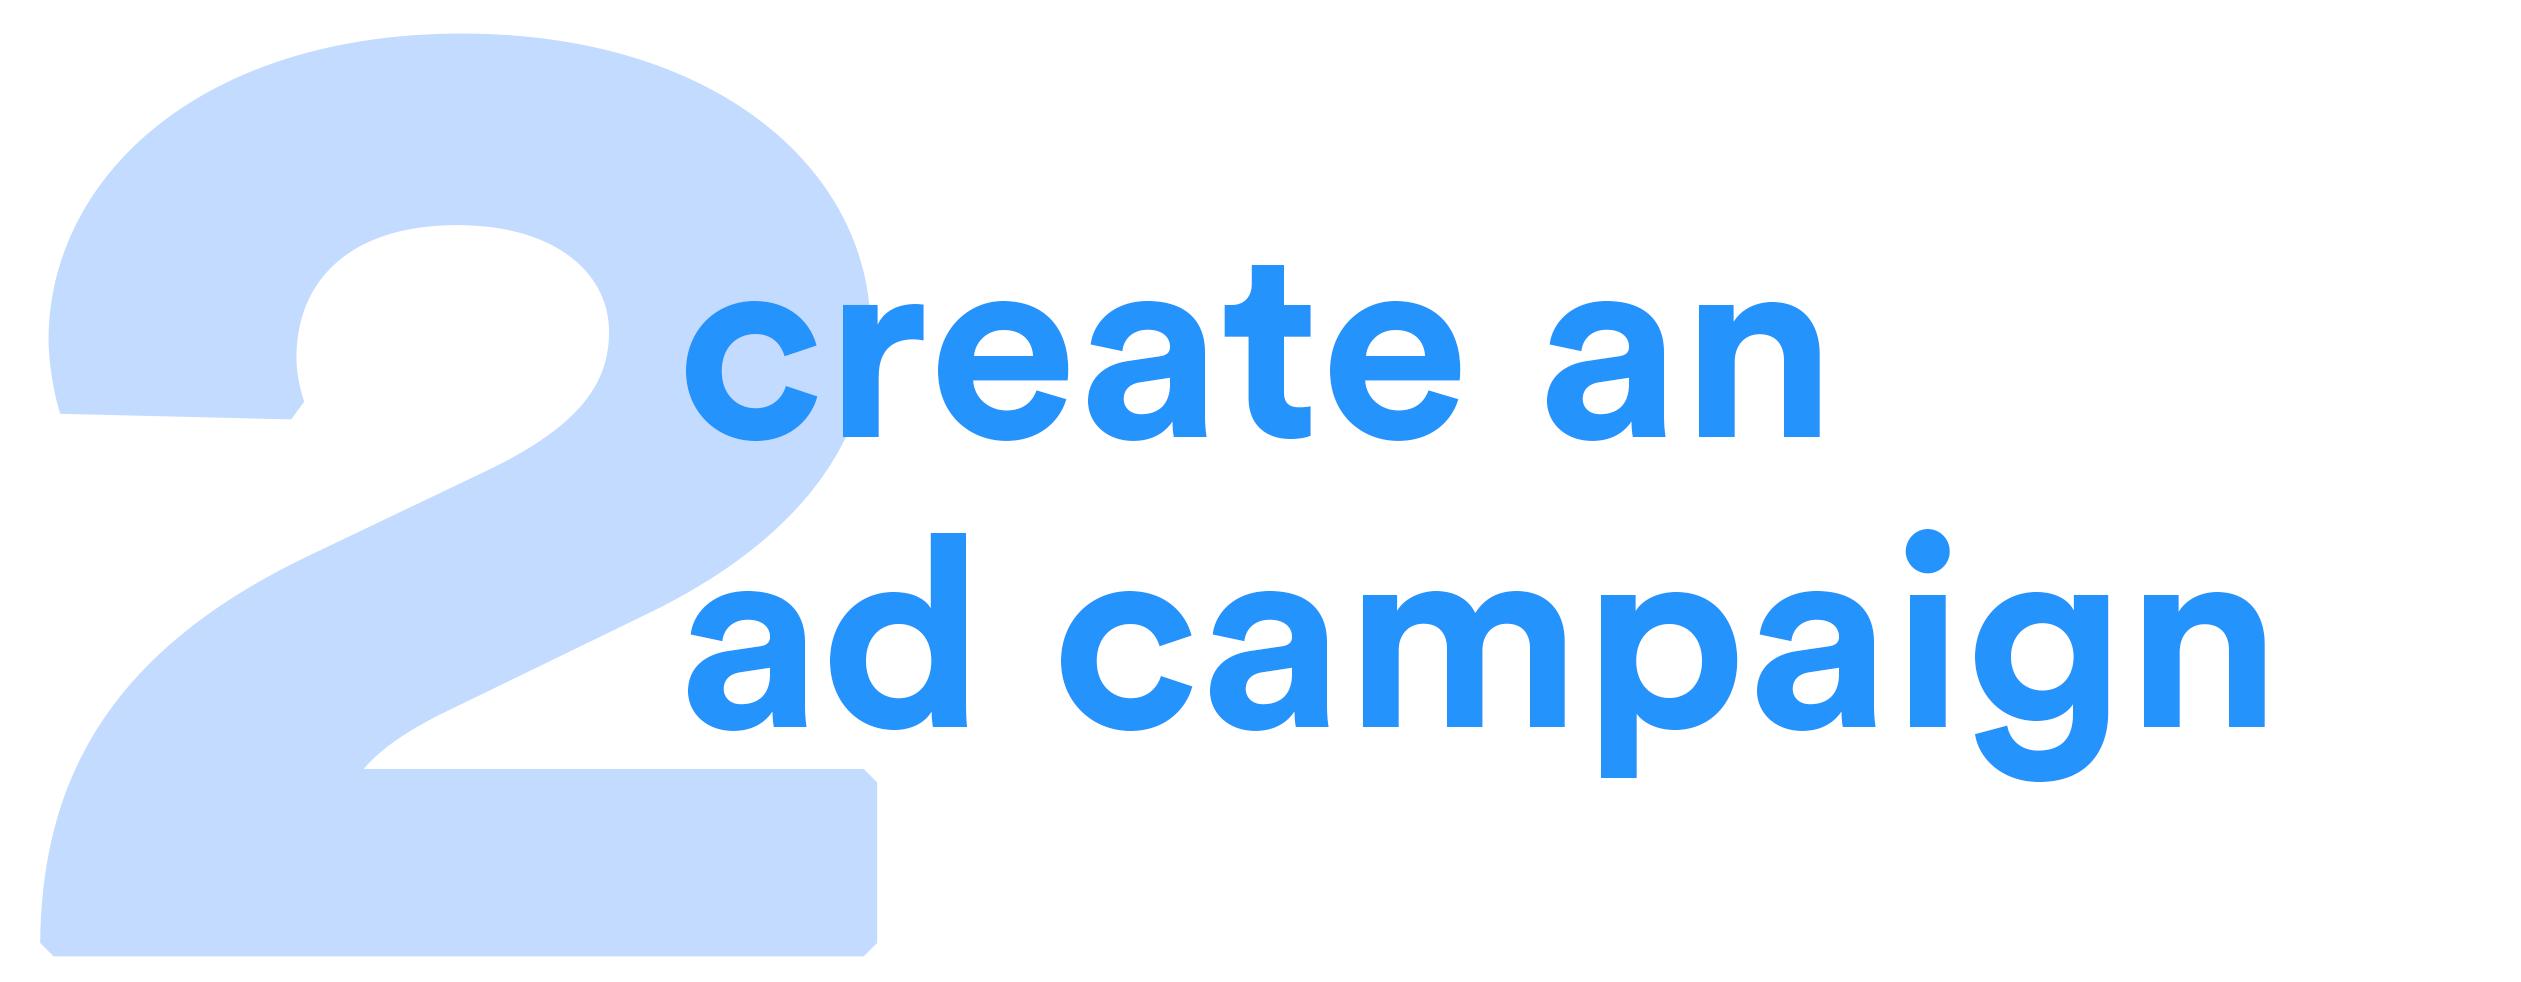 Create an ad campaign